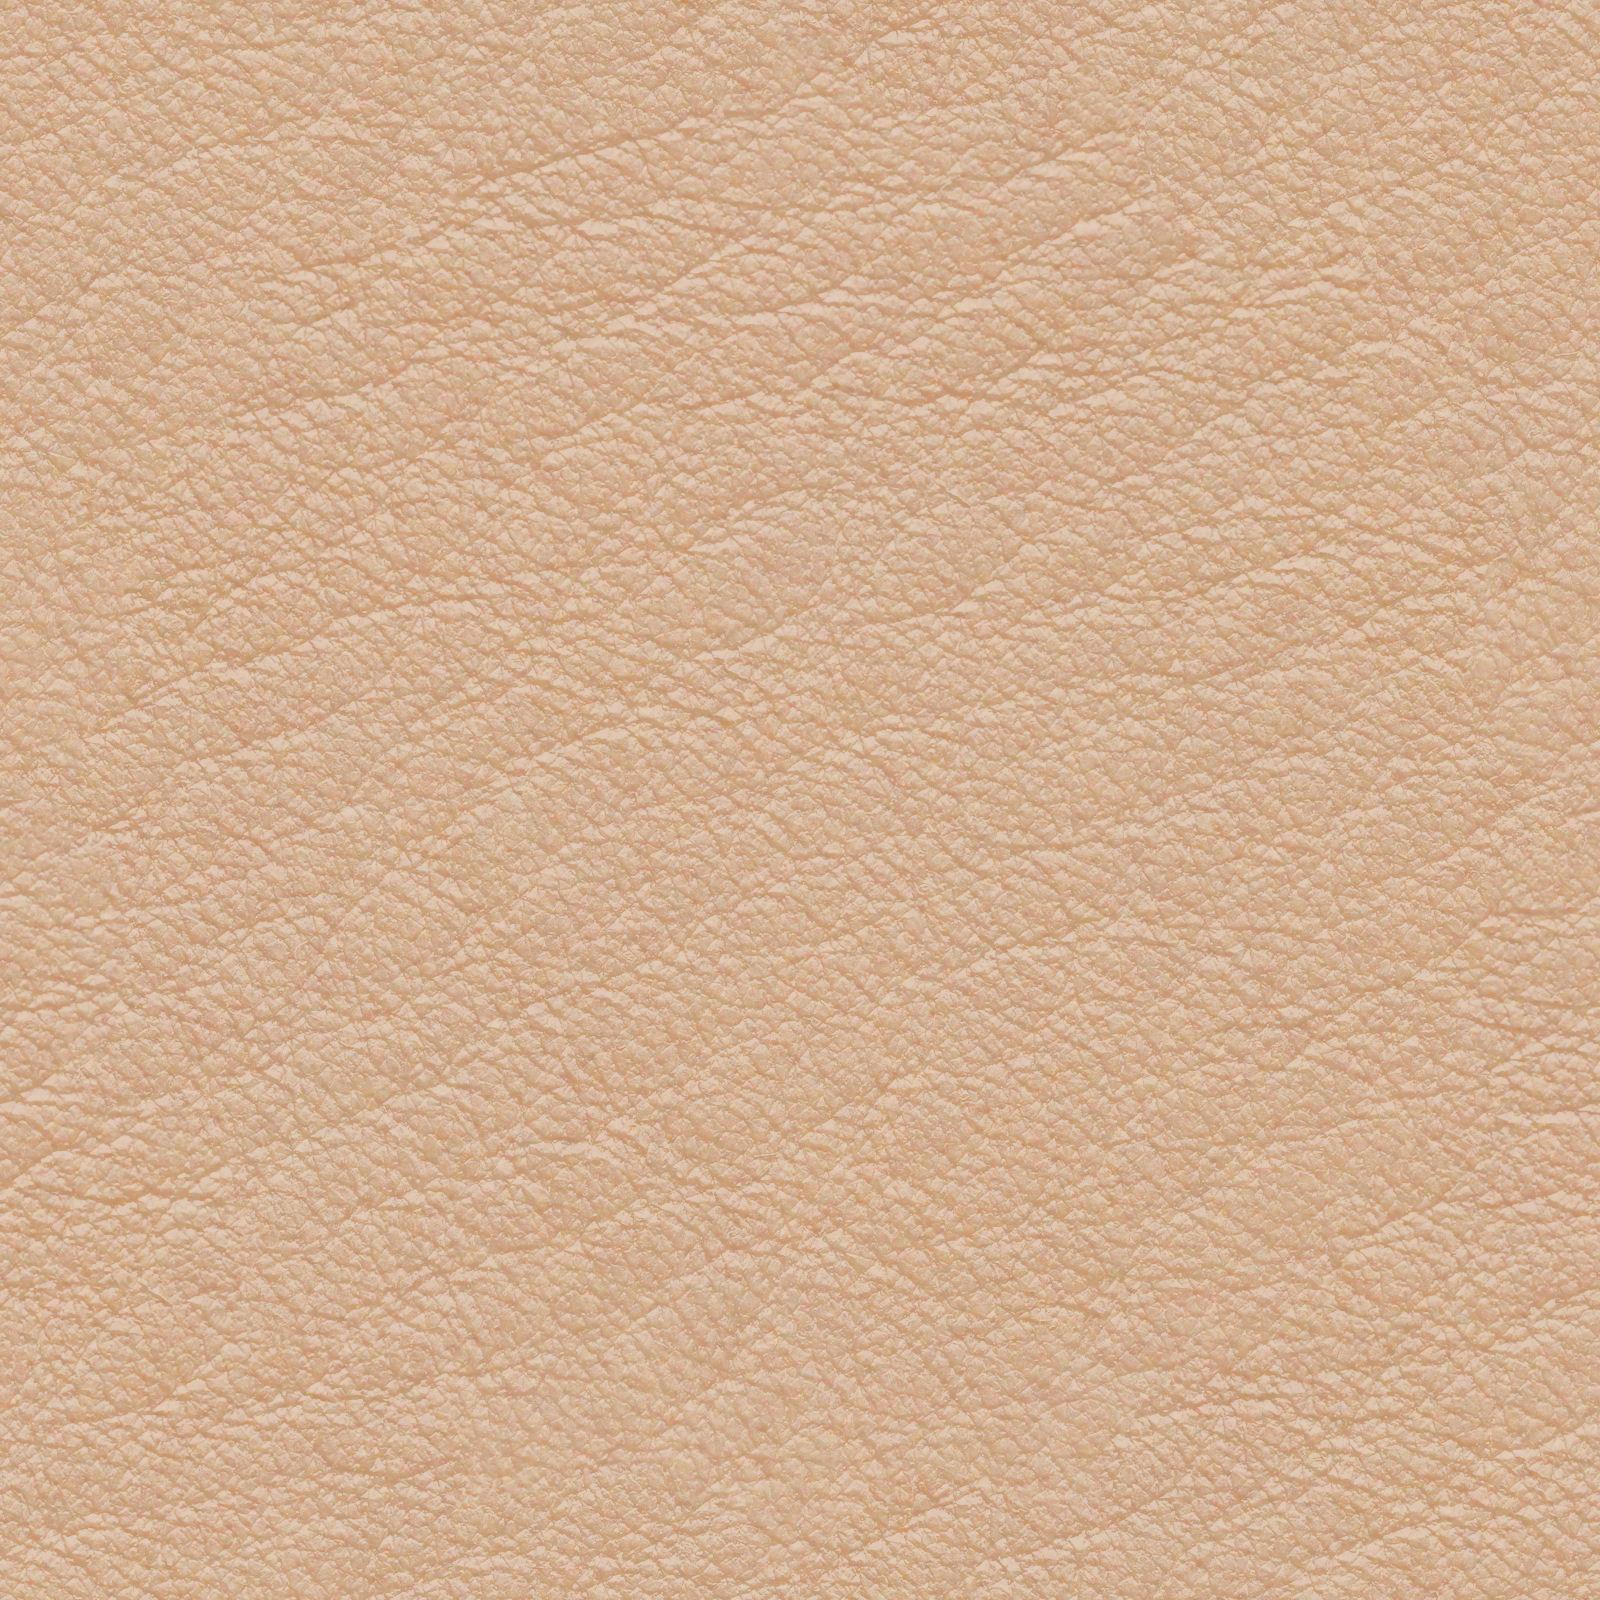 High Resolution Seamless Textures: Skin